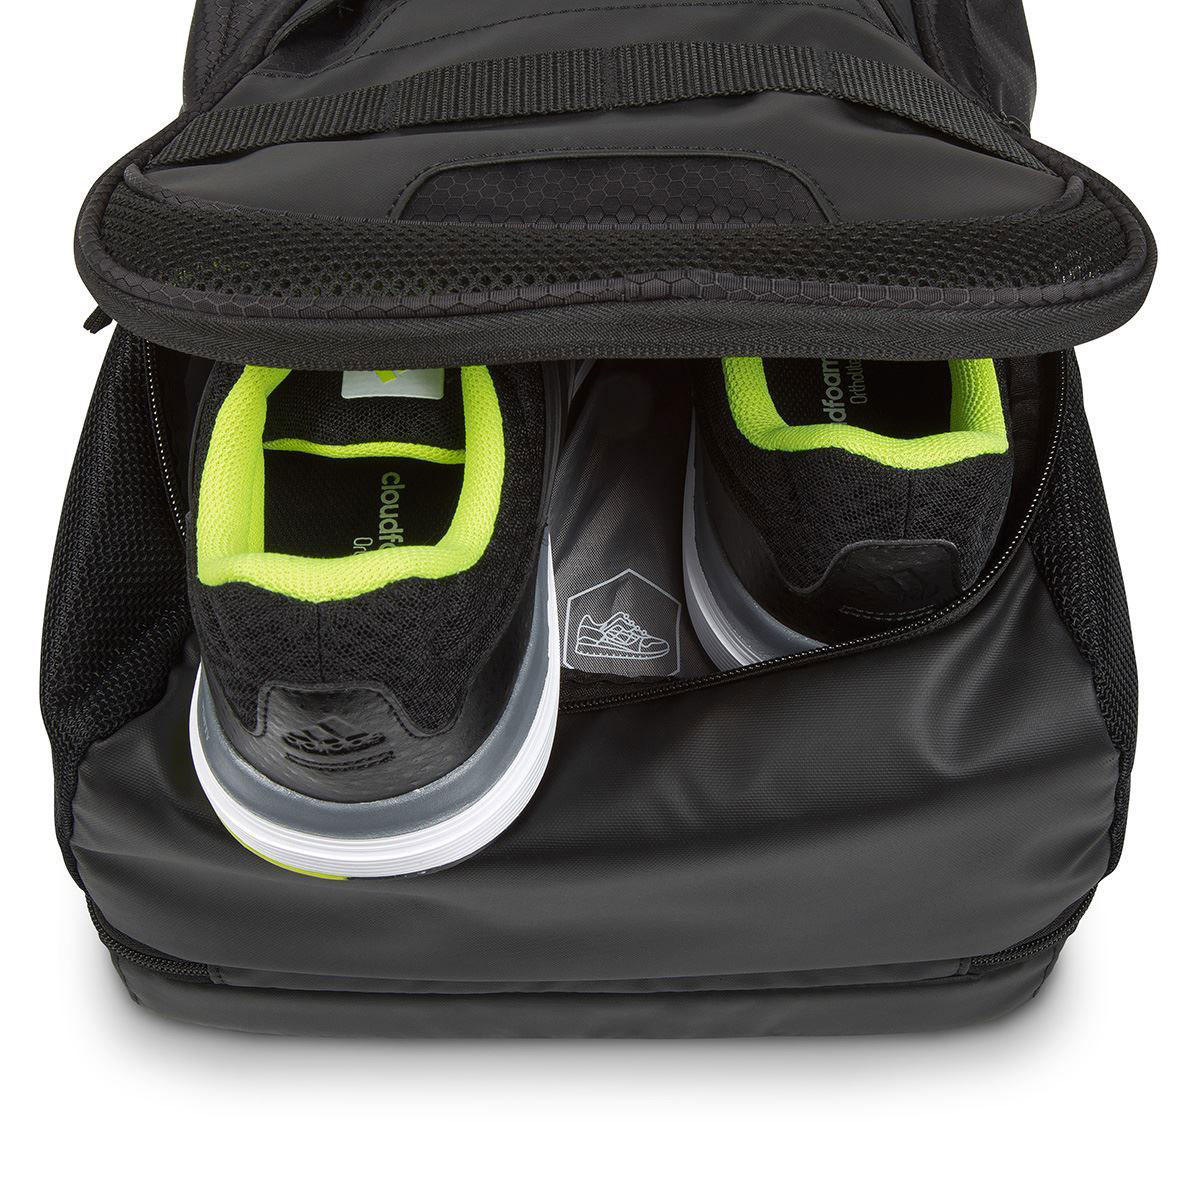 "Stamina 15.6"" Laptop Backpack Targus - Sac et sacoche - 1"